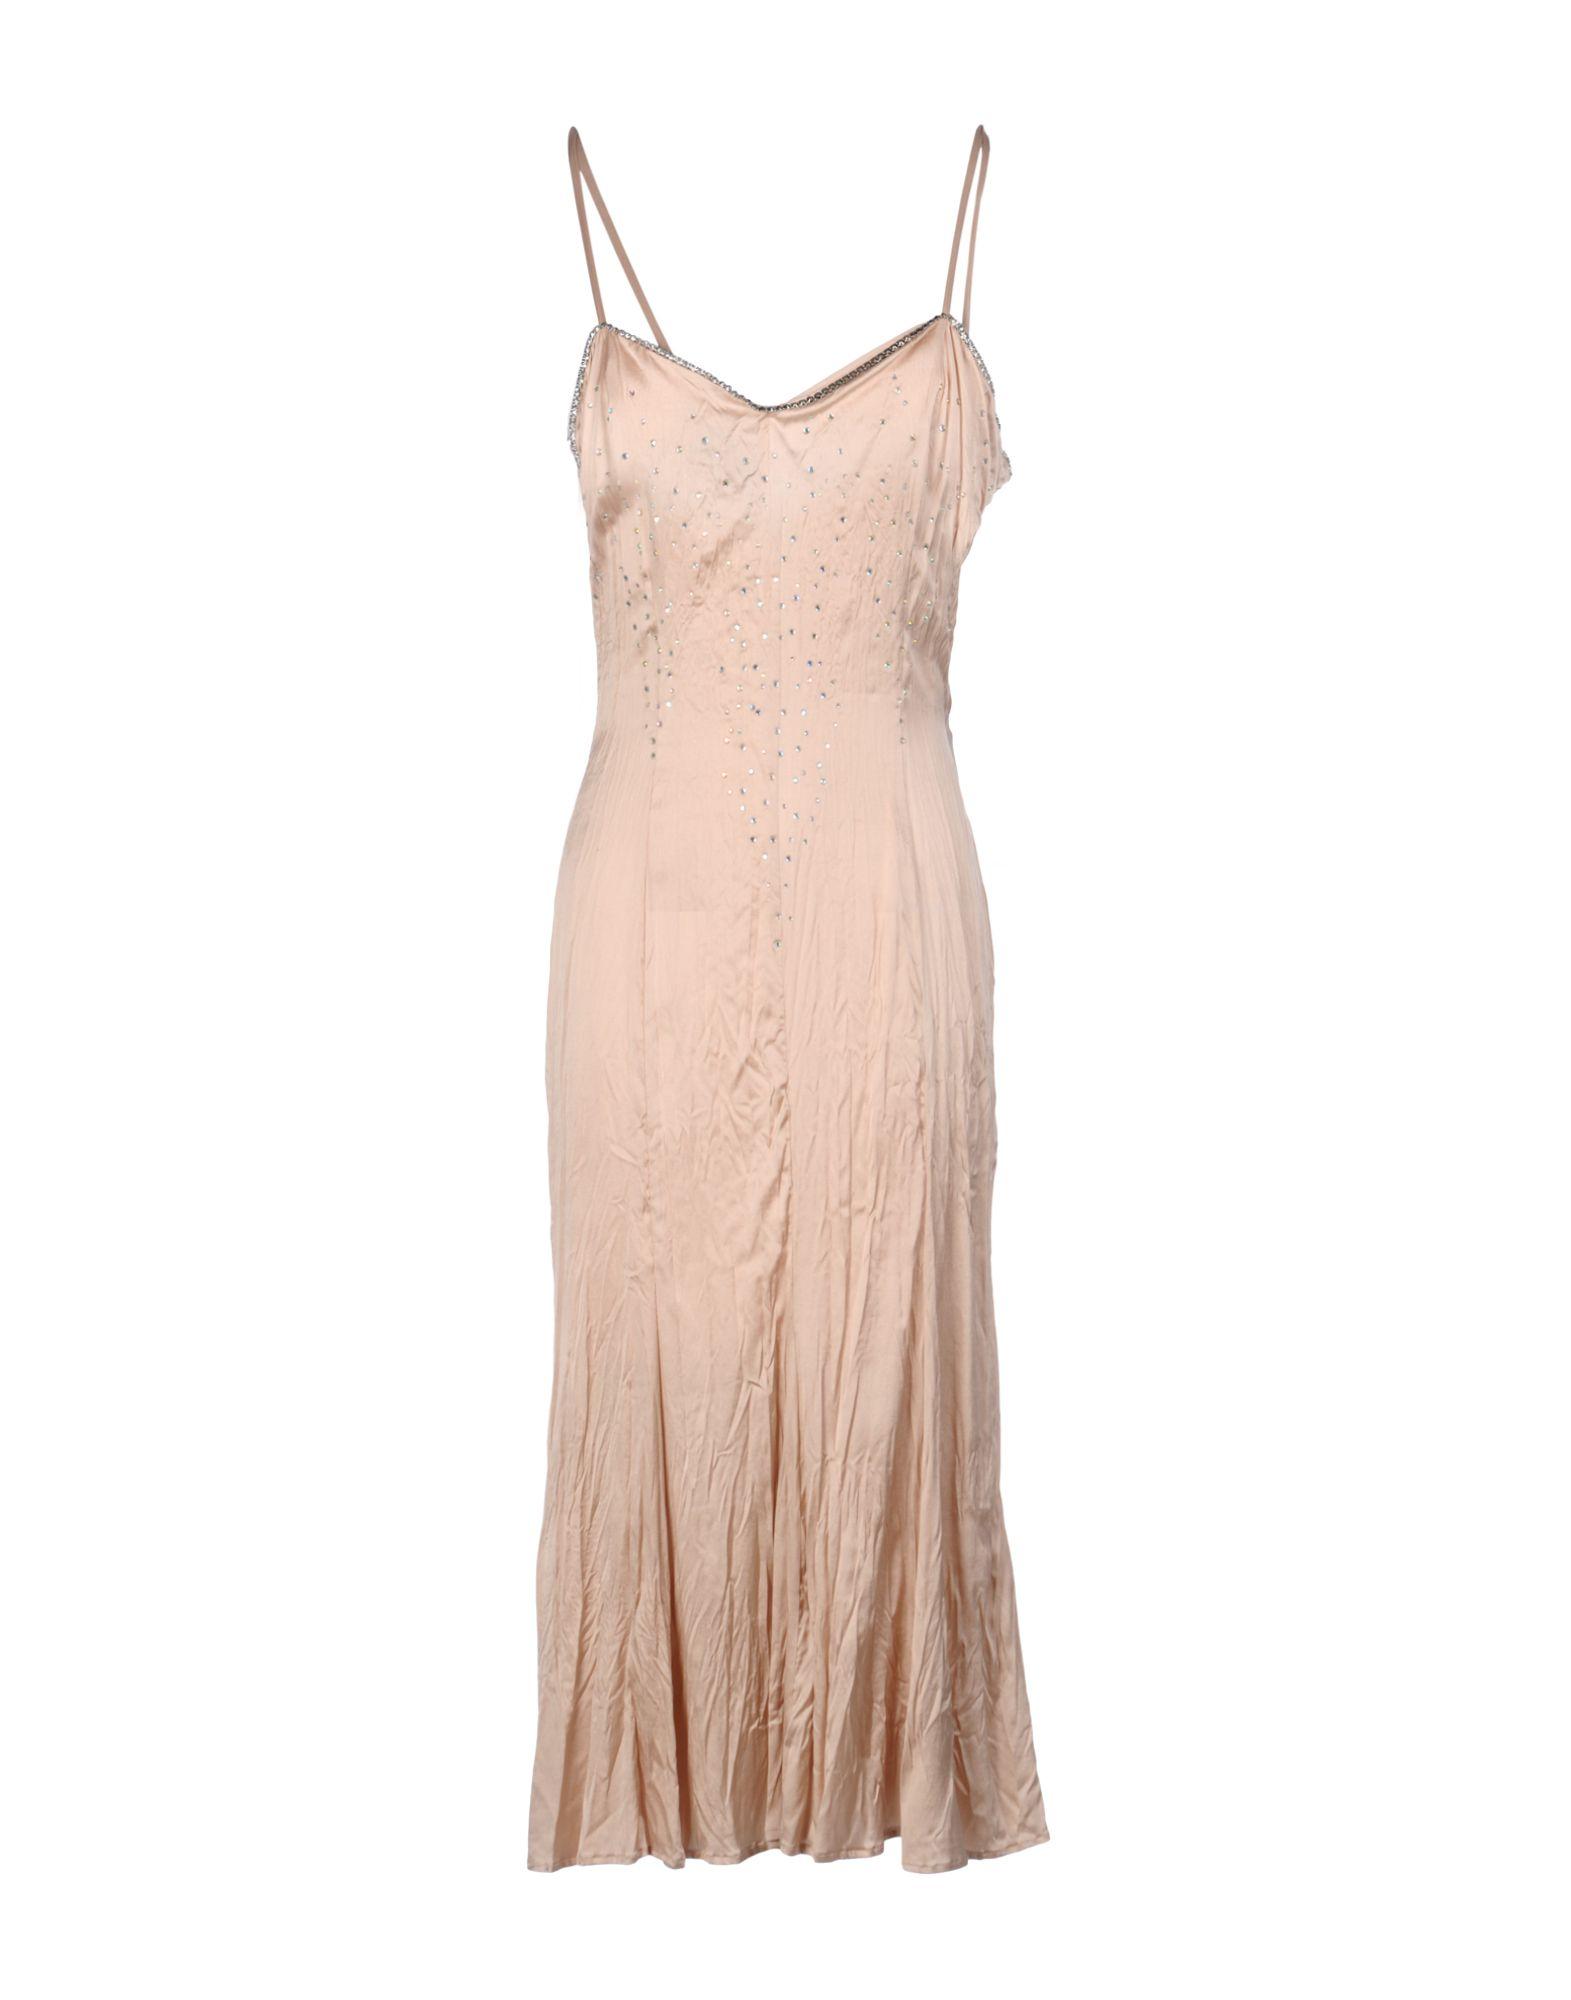 OPPIO Платье длиной 3/4 lisa corti платье длиной 3 4